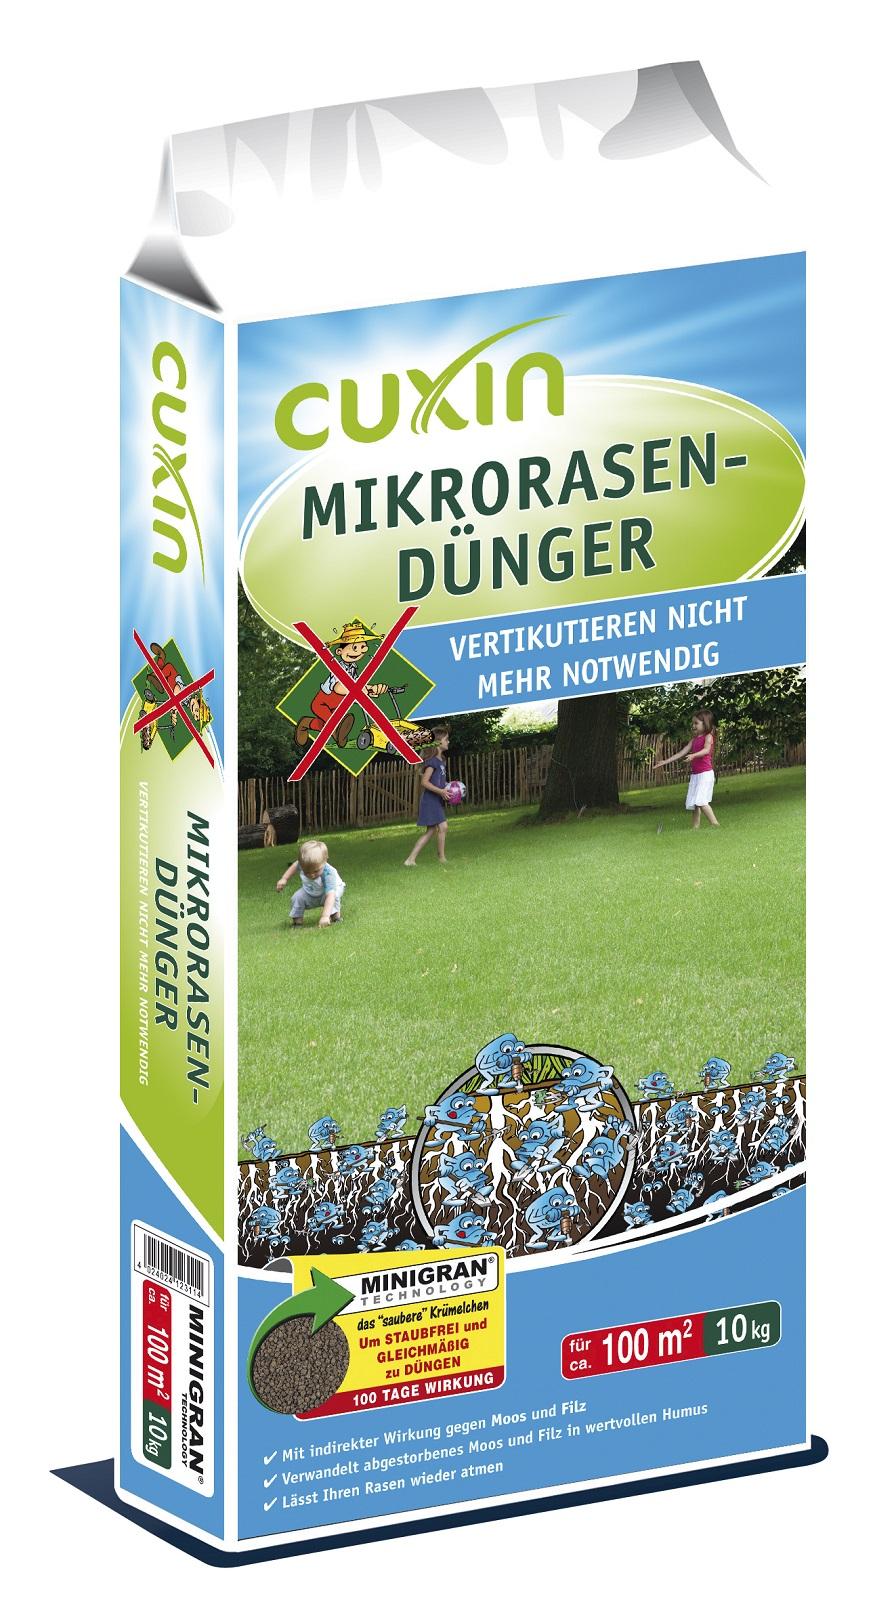 Cuxin Micro Rasendünger 10 kg